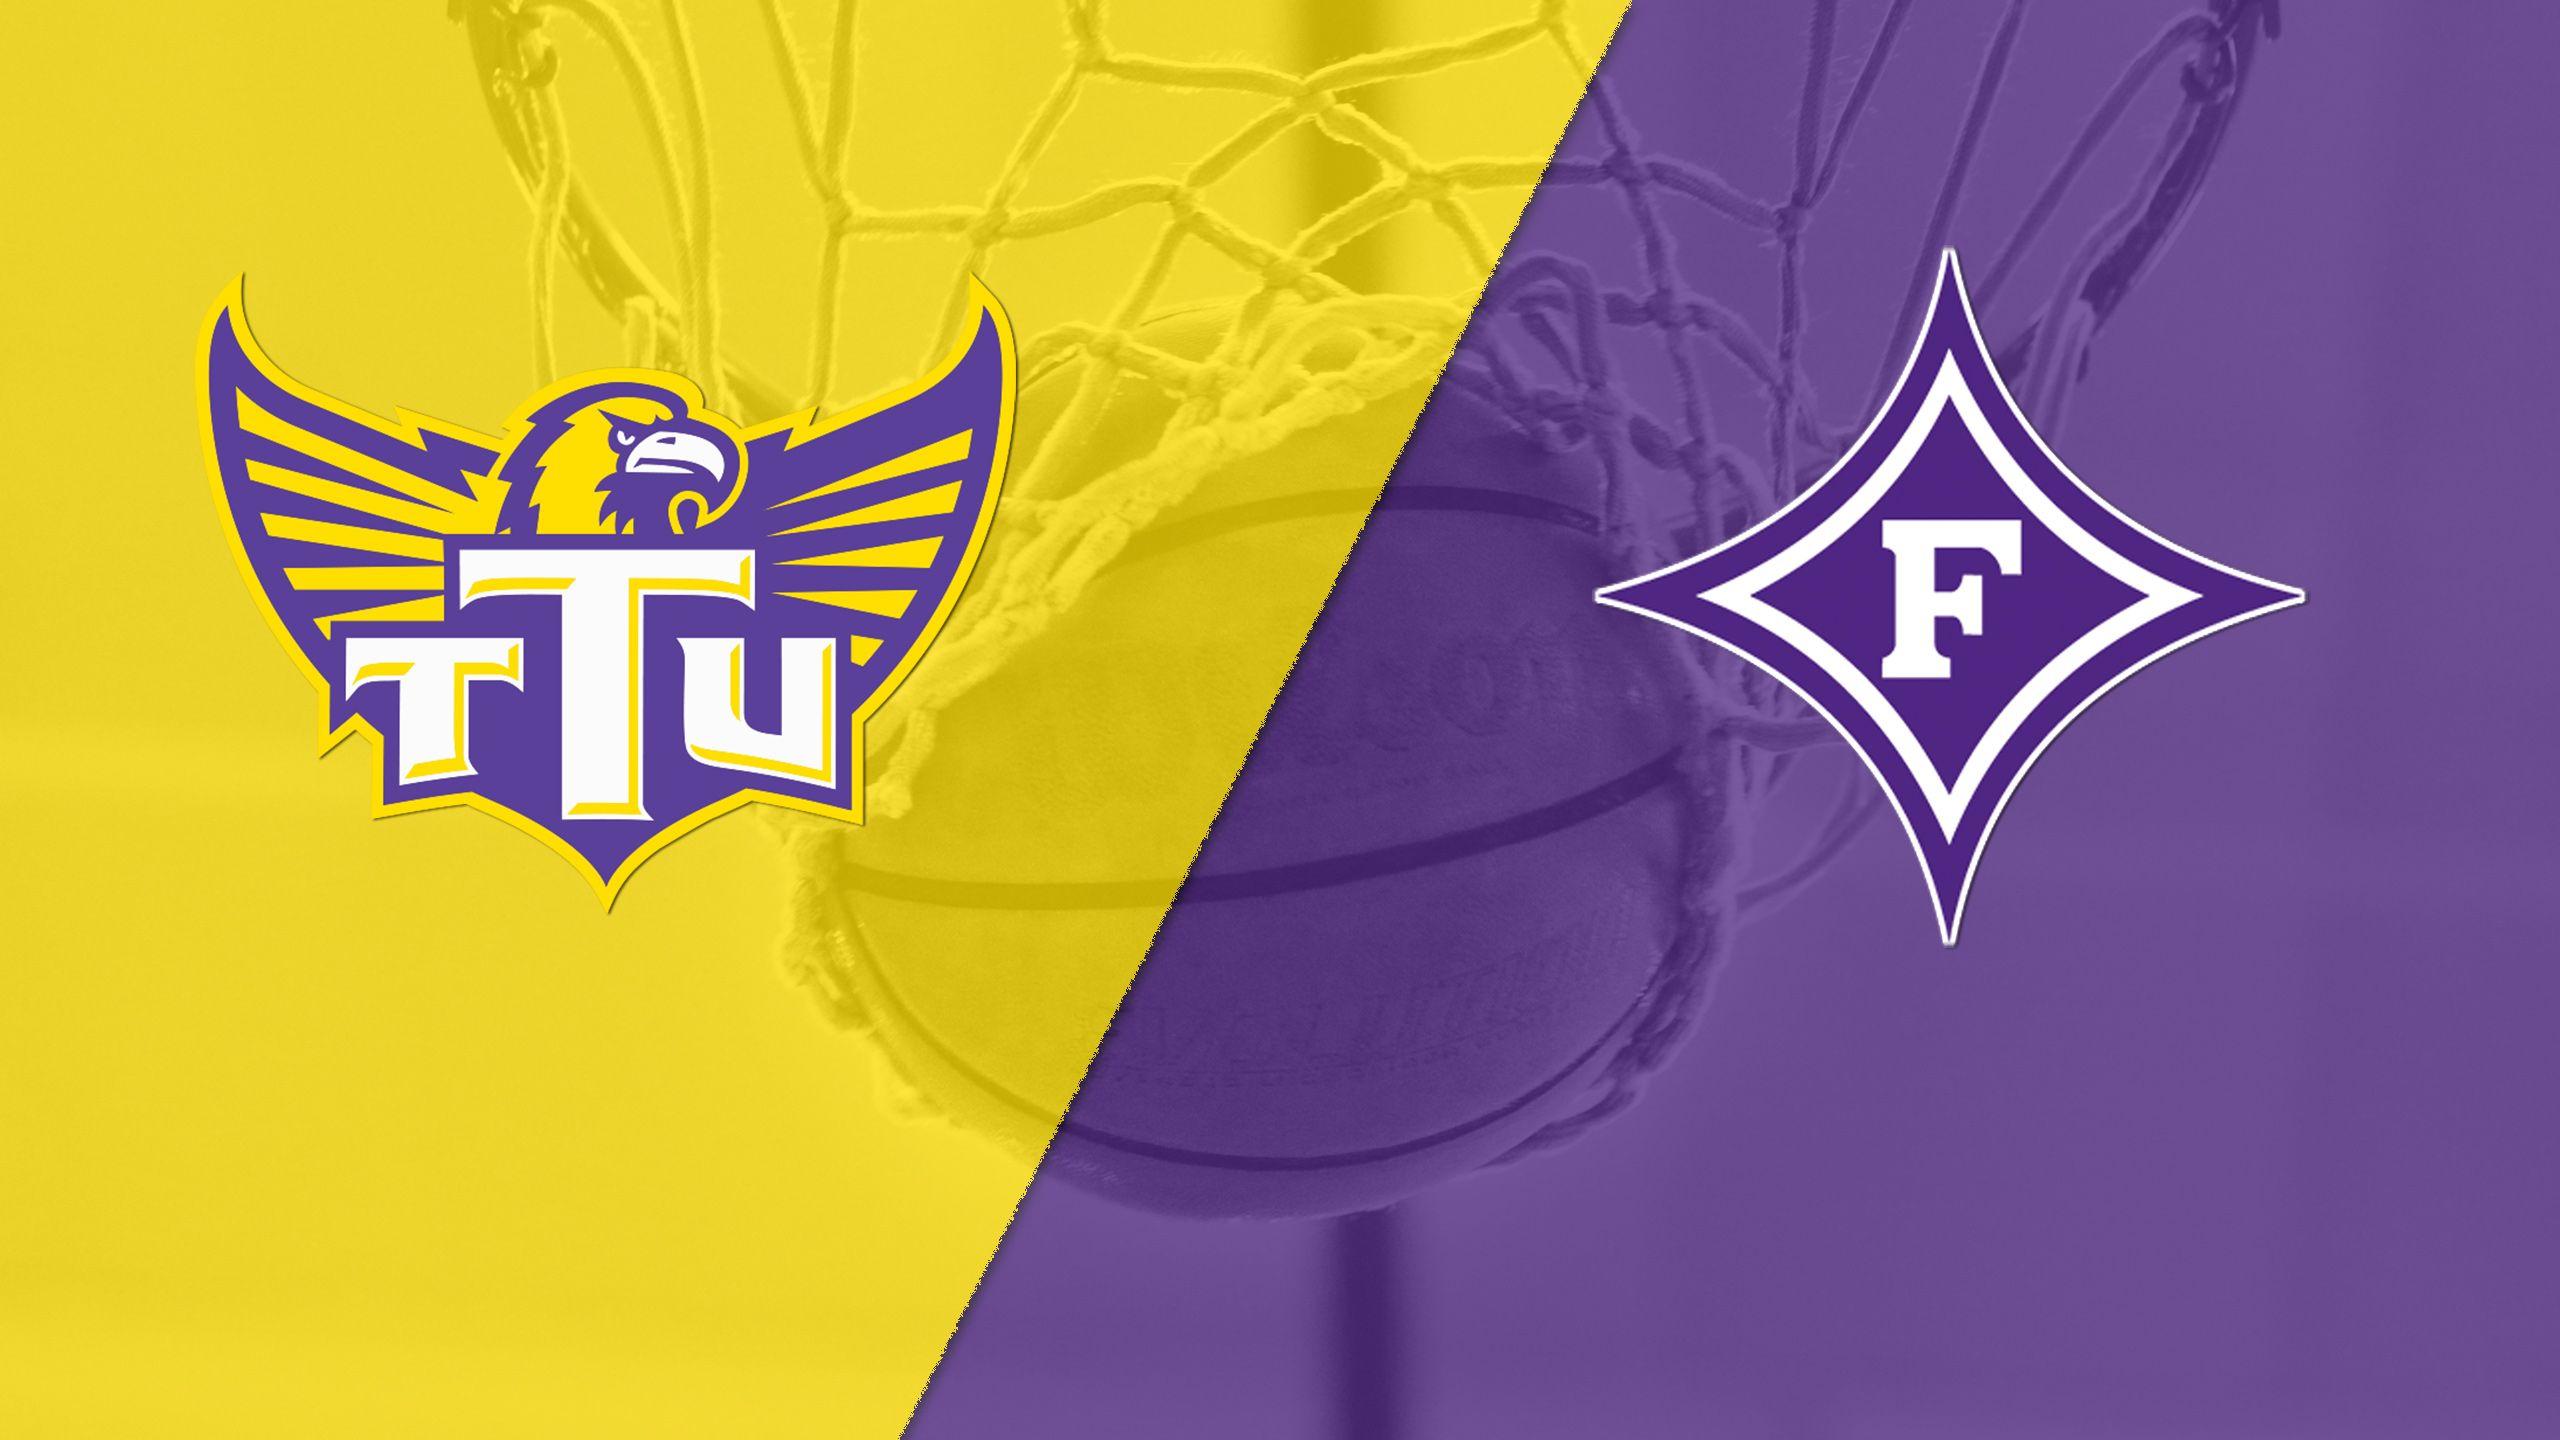 Tennessee Tech vs. Furman (M Basketball)